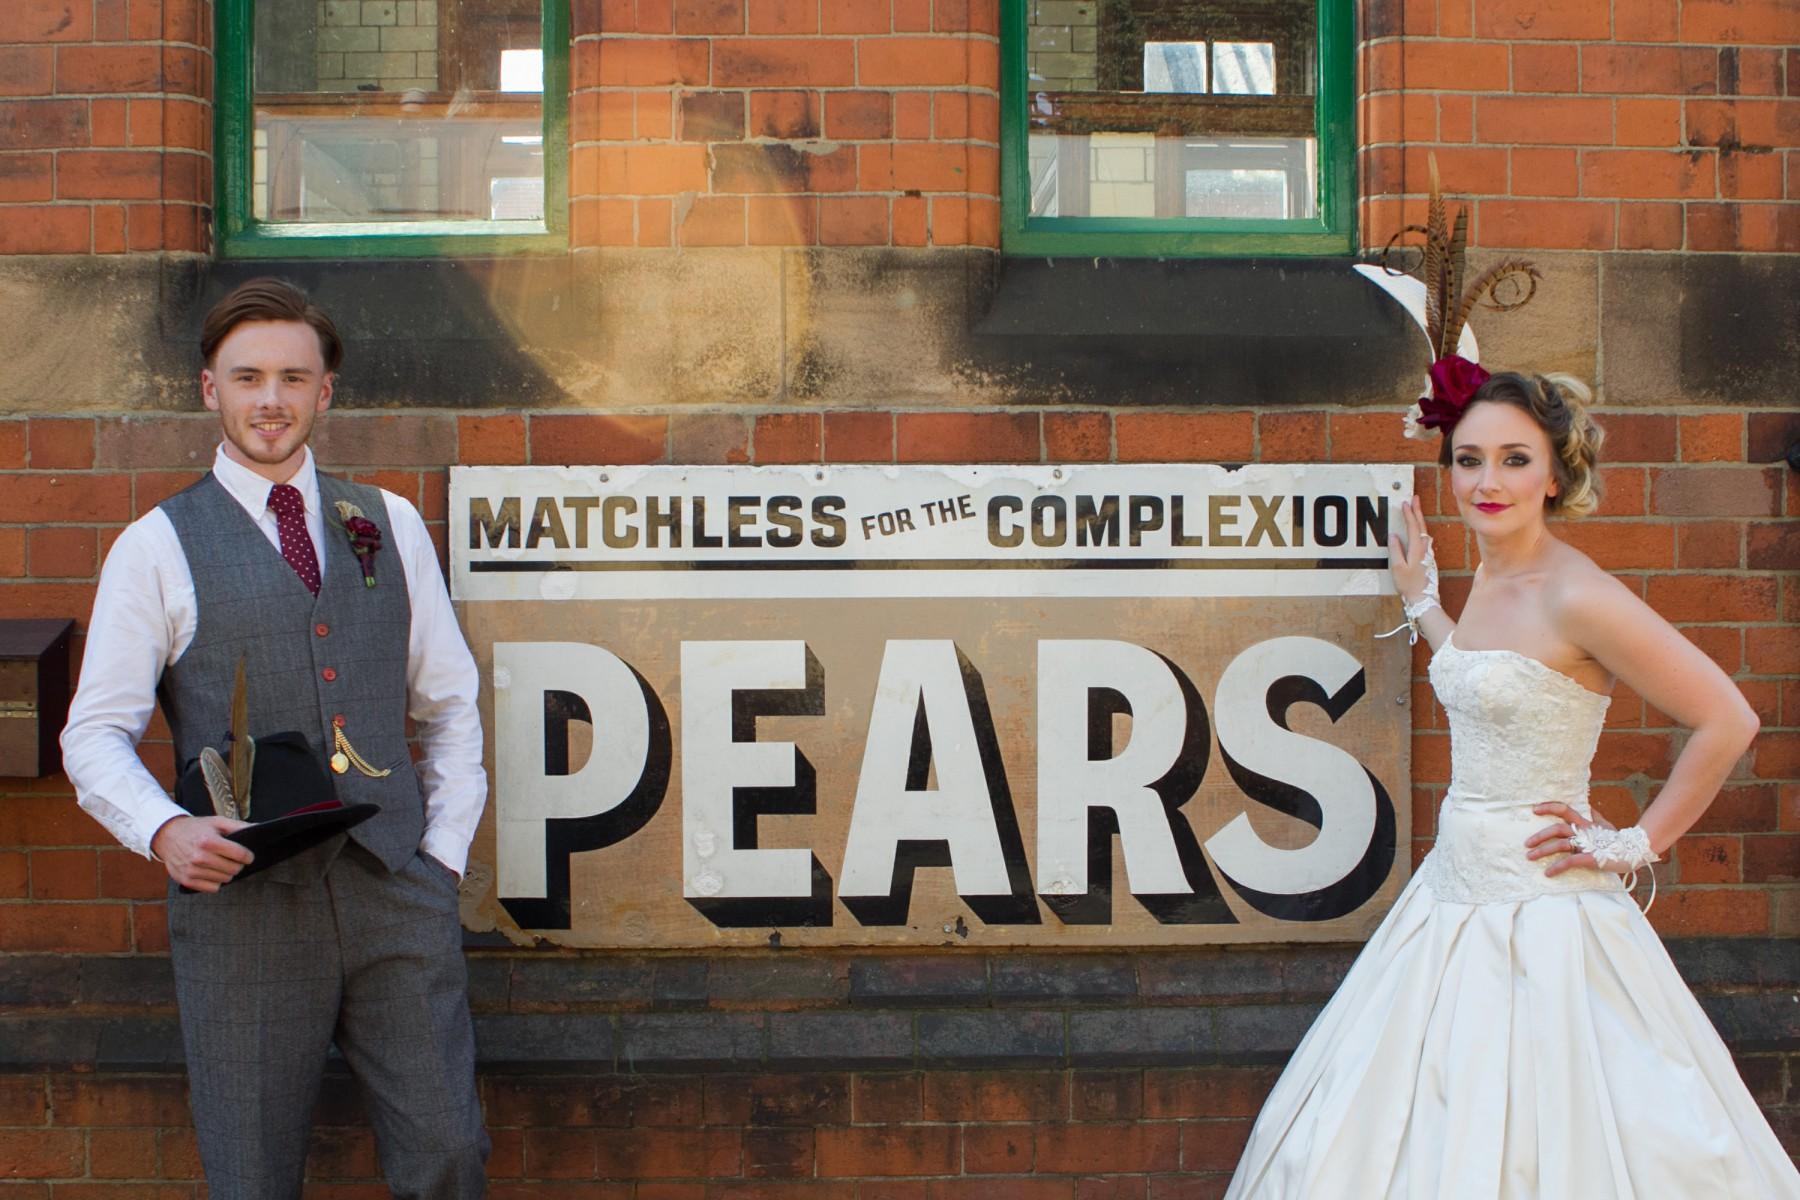 Iso Elegant Photography - Leicester wedding network - Railway wedding - vintage wedding 38